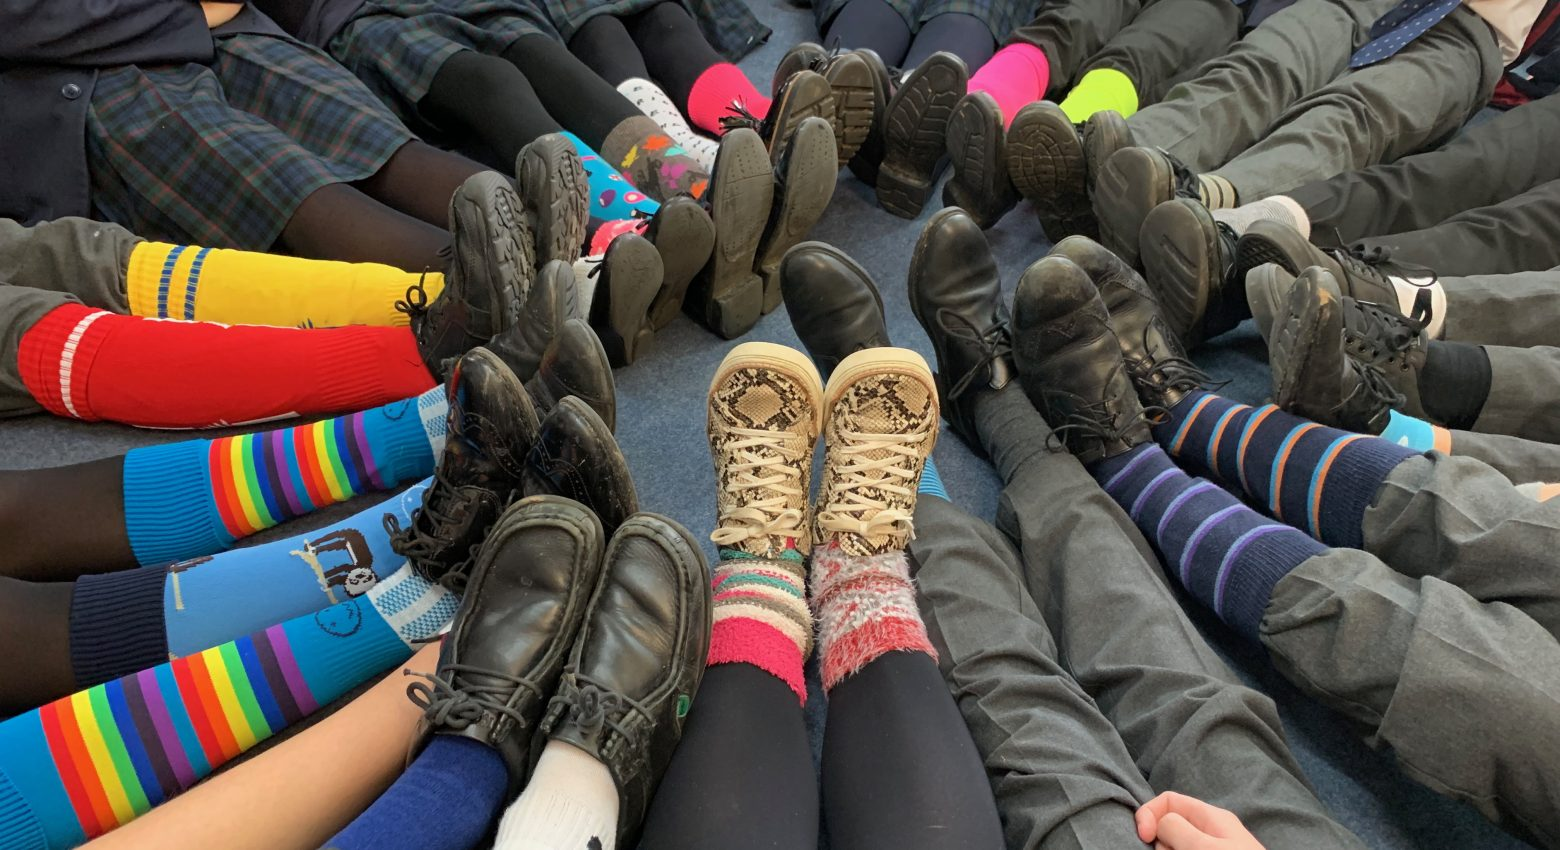 Wearing odd socks for anti-bullying week